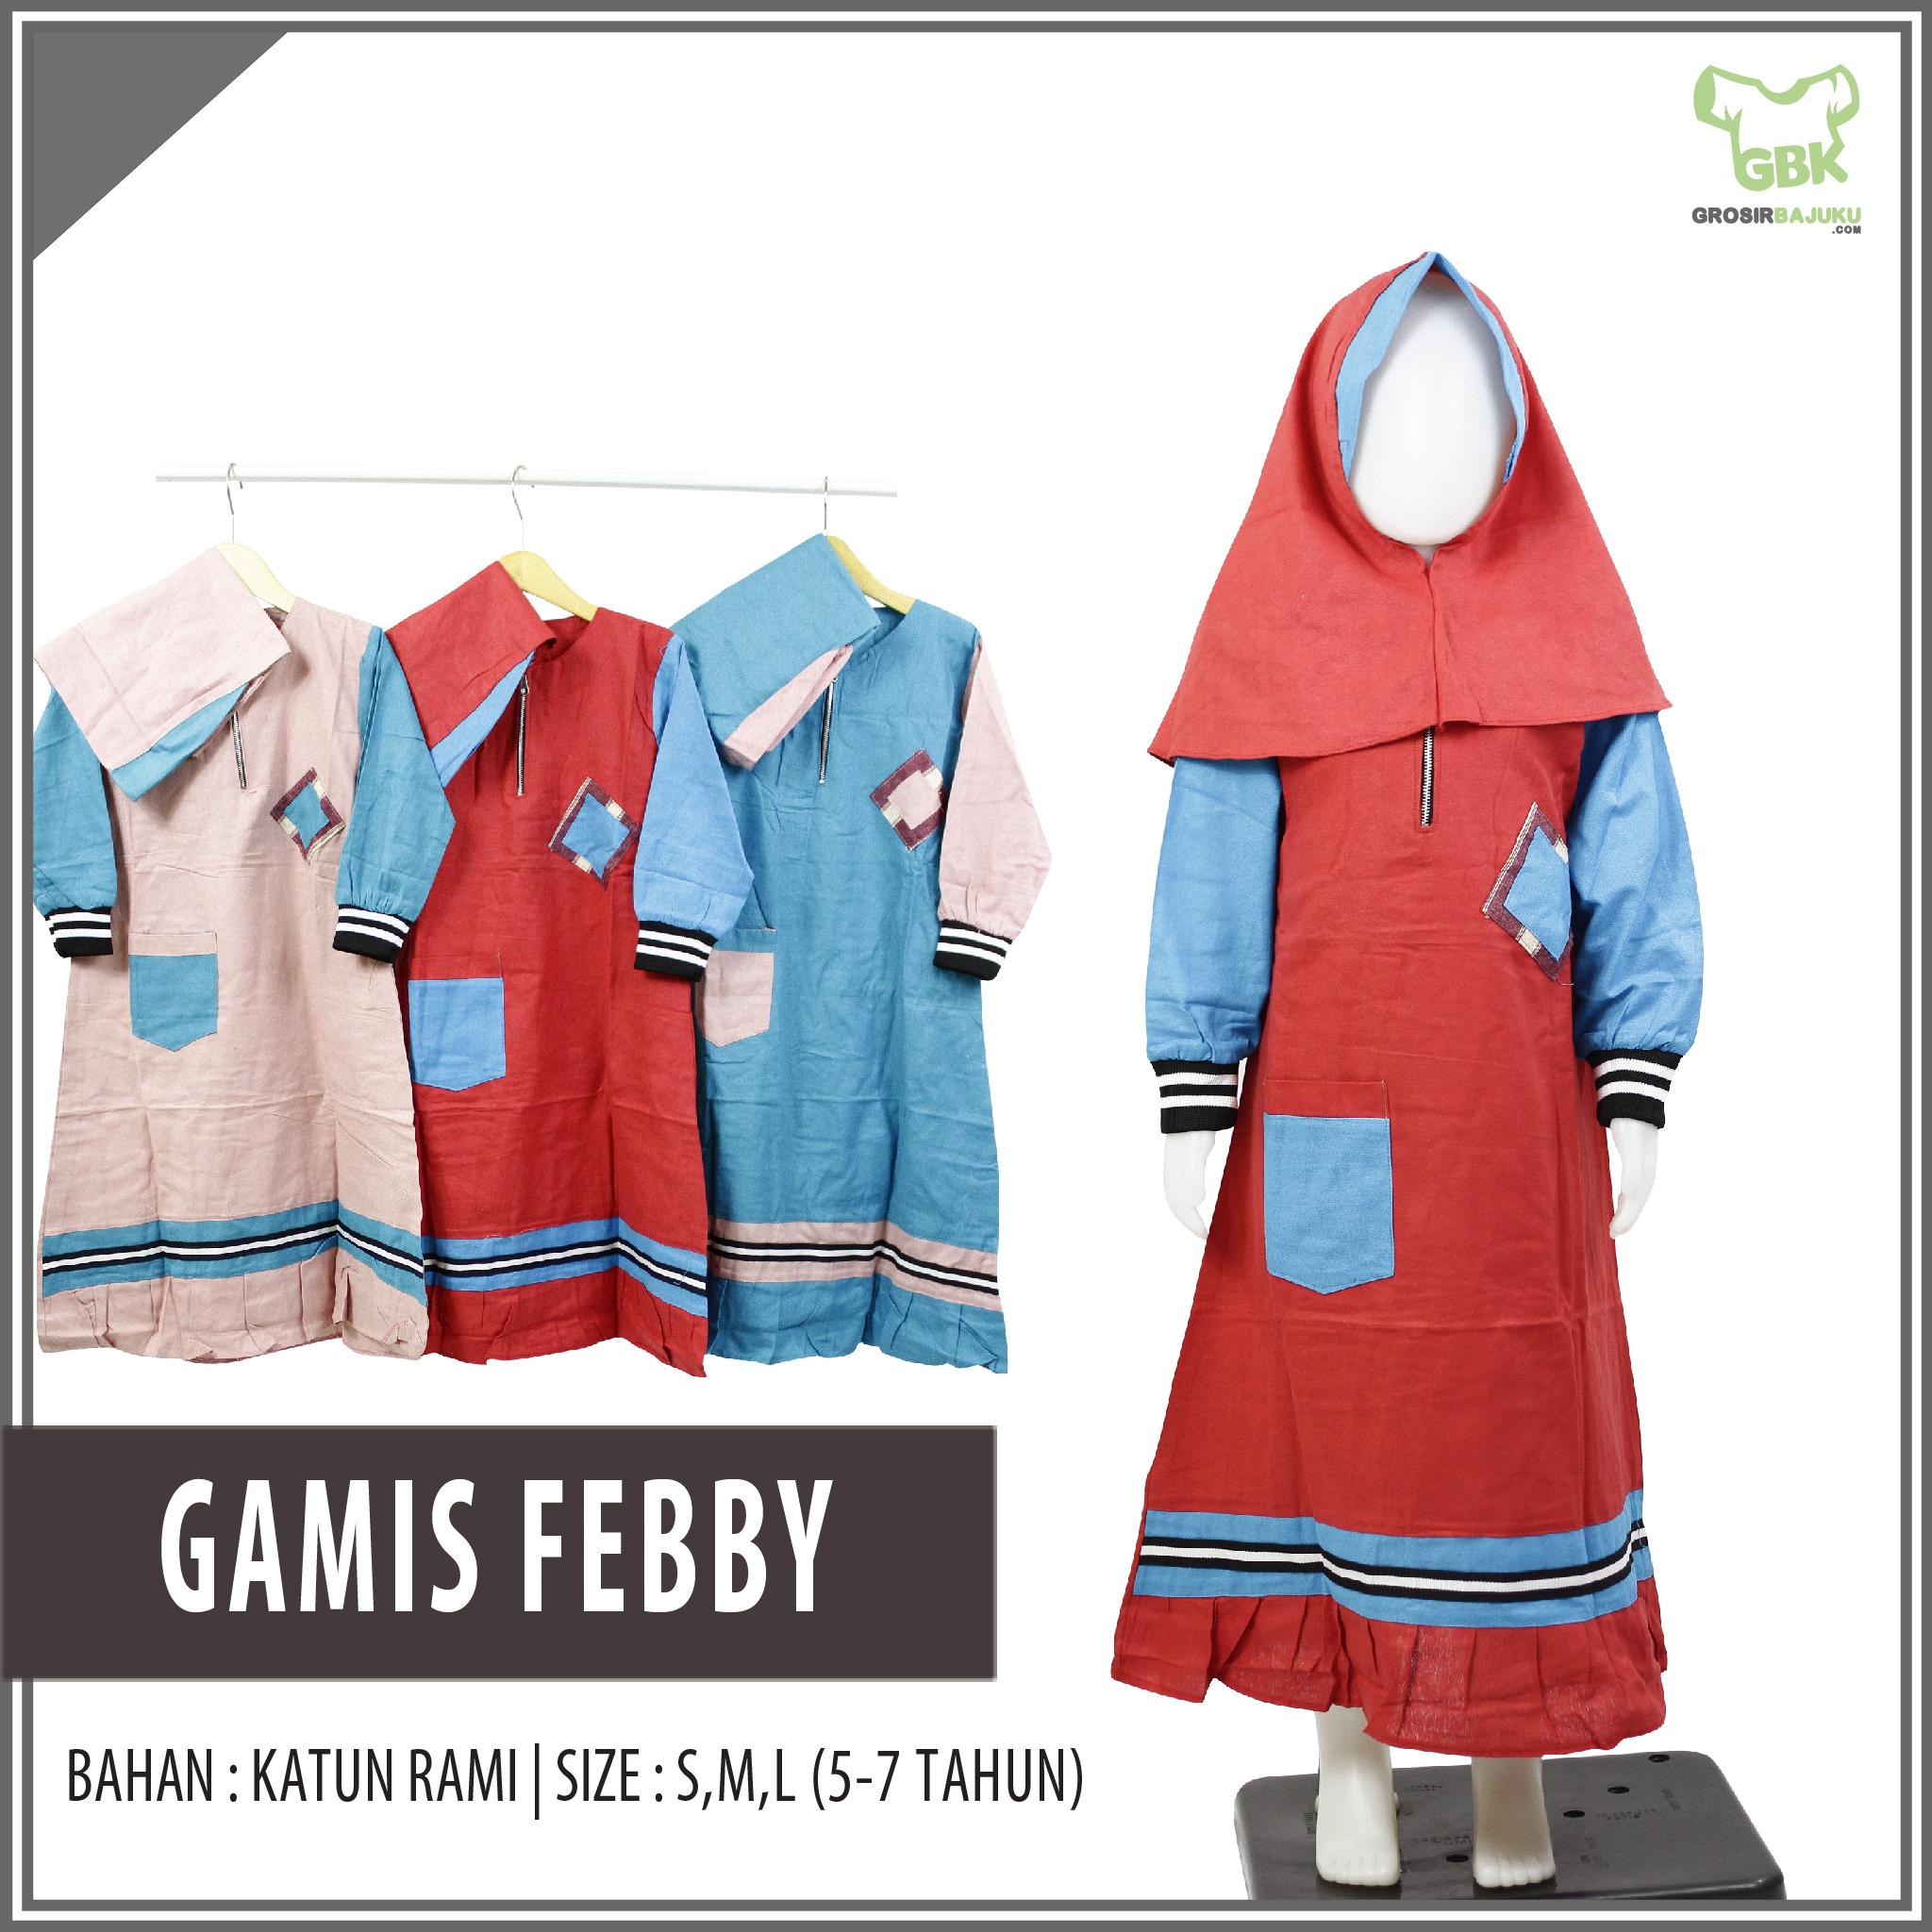 Gamis Febby SML